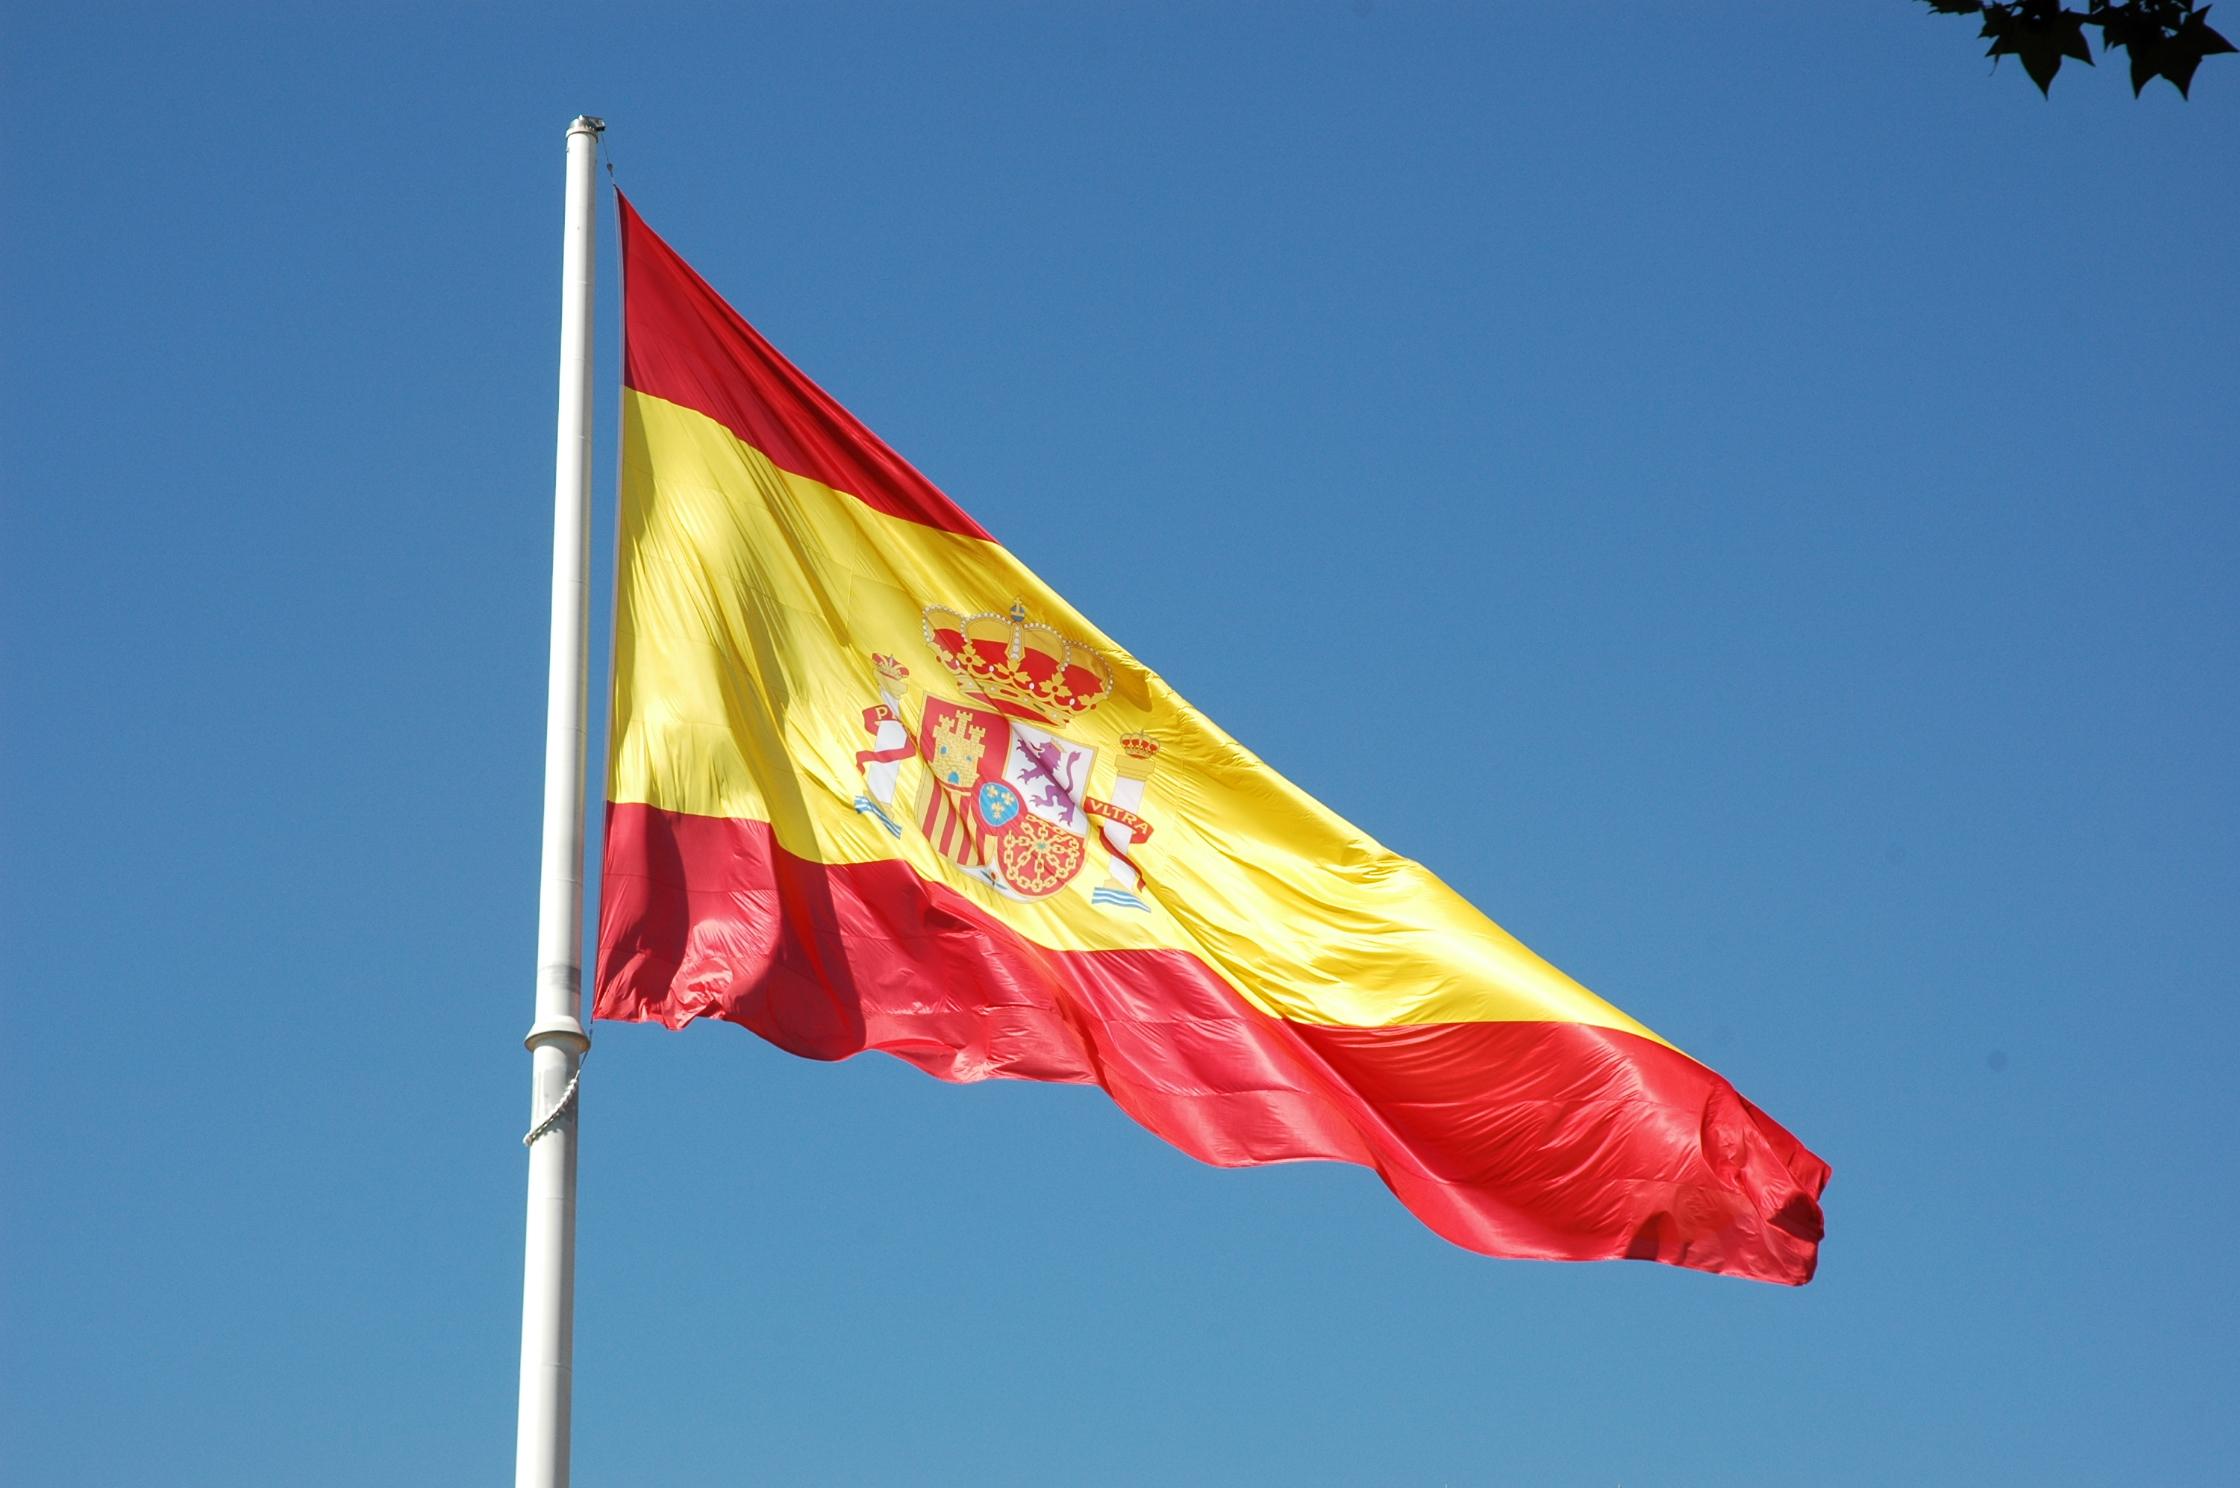 Nacional Espana Nacional de España pl